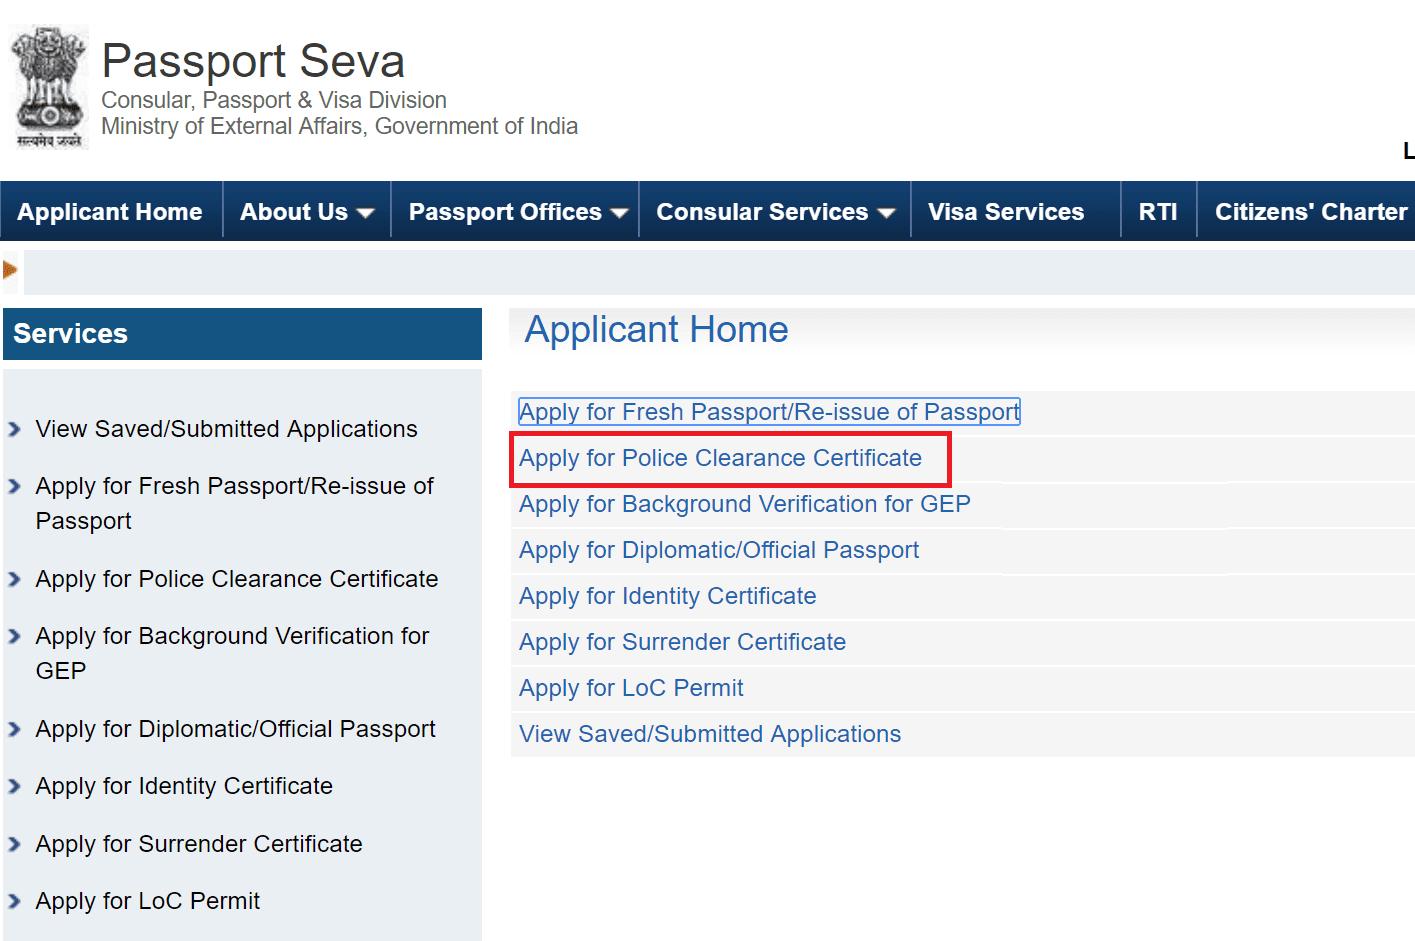 Police Clearance Certificate Kaise Banwaye? - ऑनलाइन